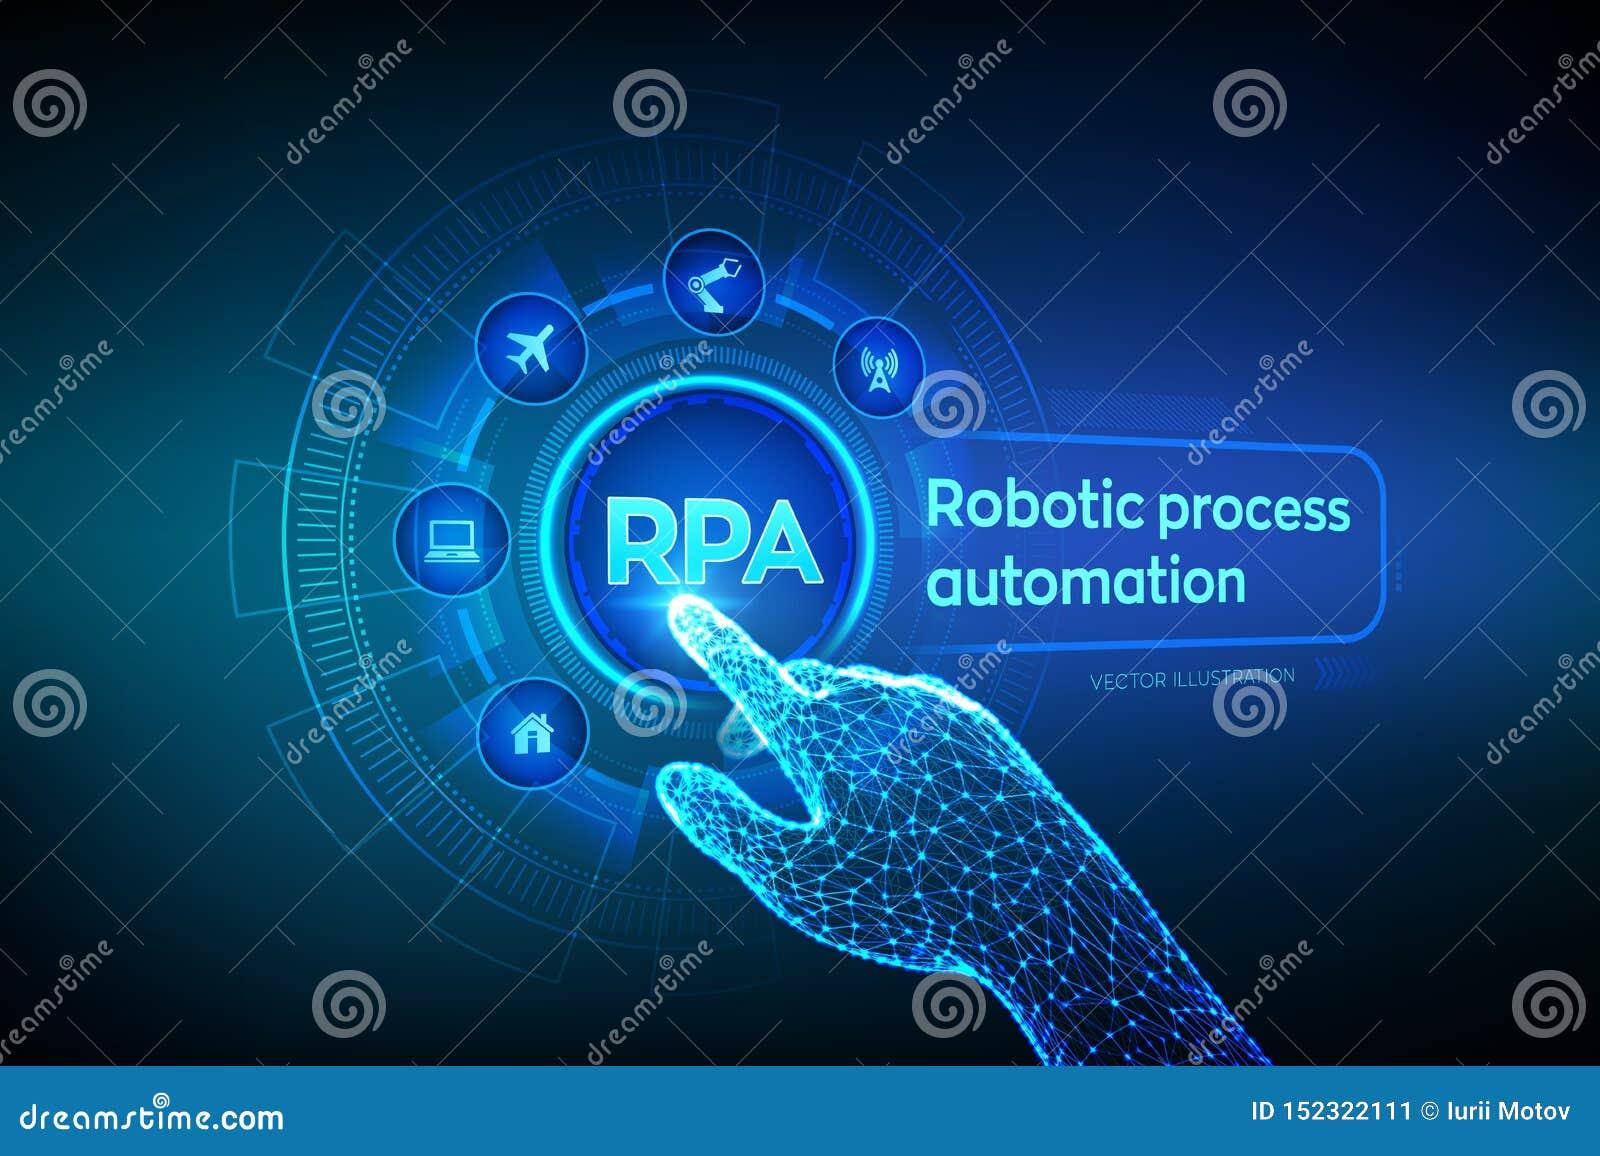 Rpa Robotic Process Automation Innovation Technology